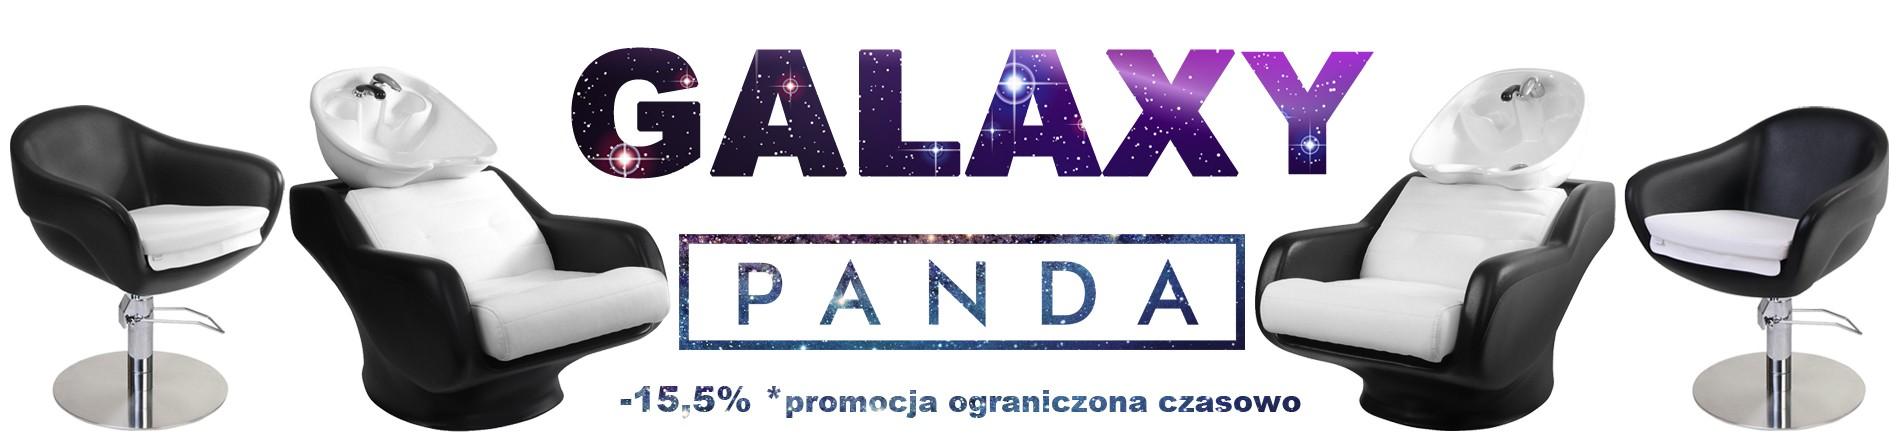 Panda Galaxy Express Line -15%